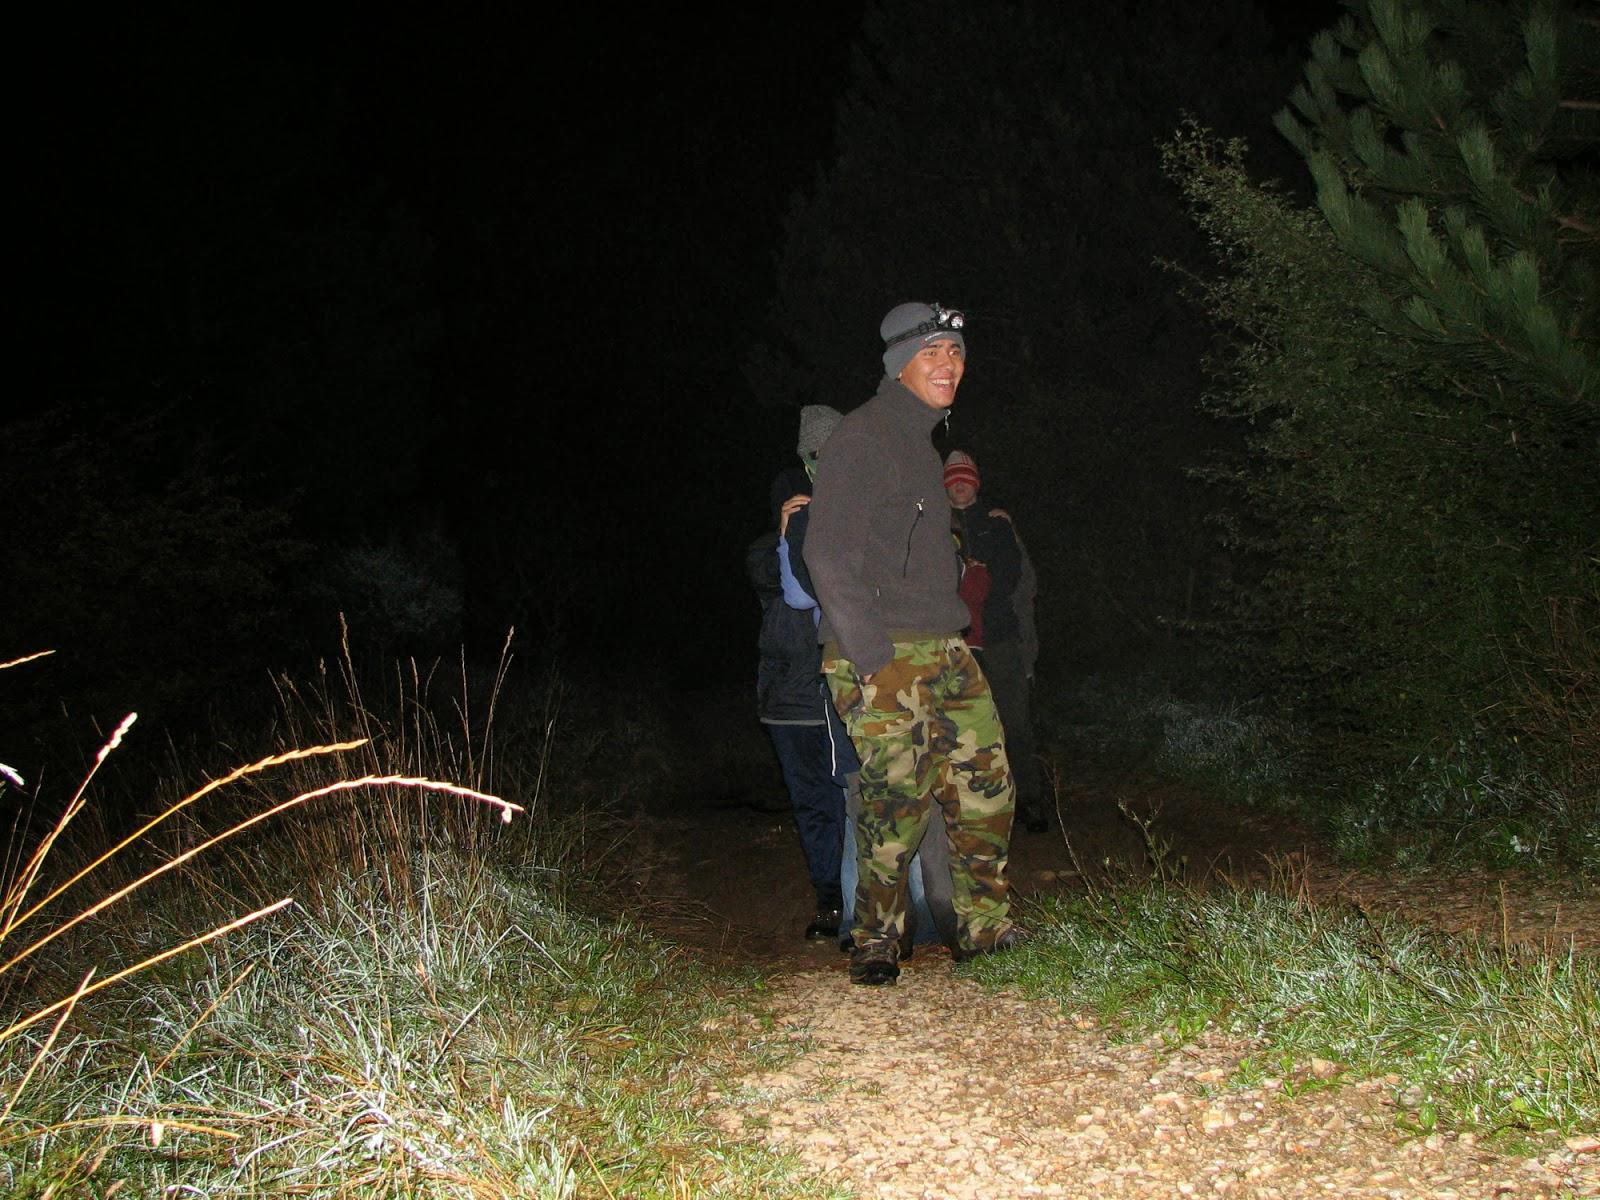 Prehod PP, Ilirska Bistrica 2005 - picture%2B064.jpg